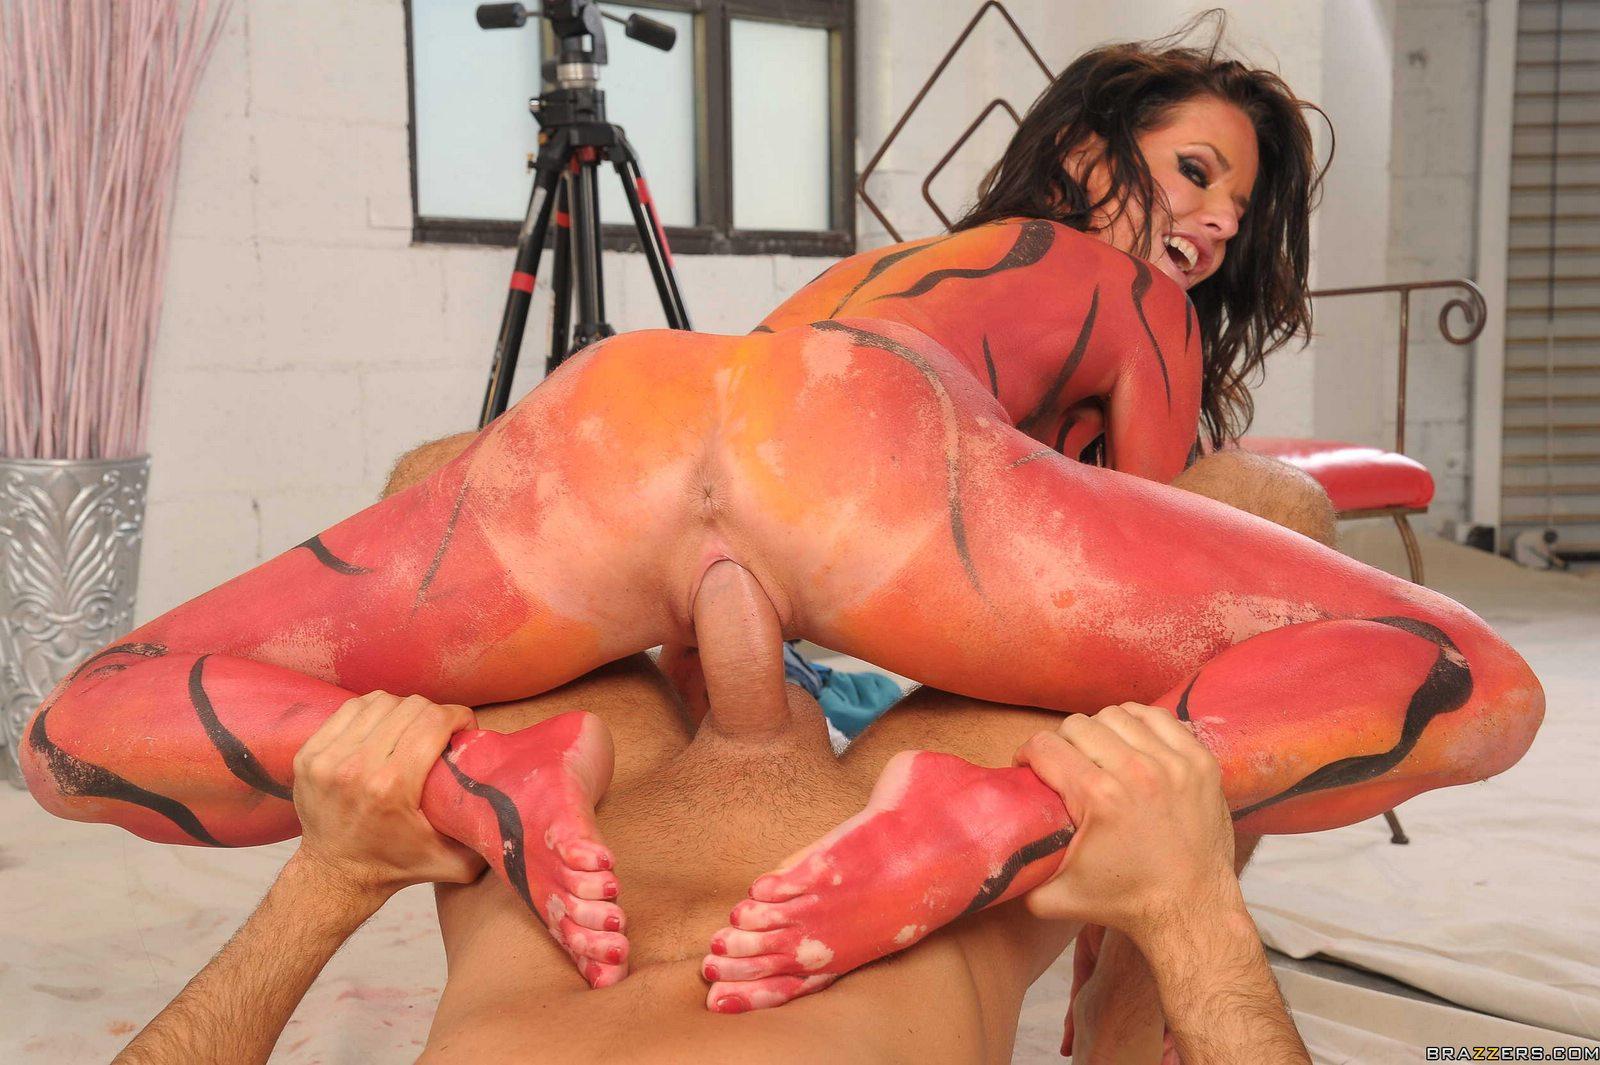 inserting vegetable in anus